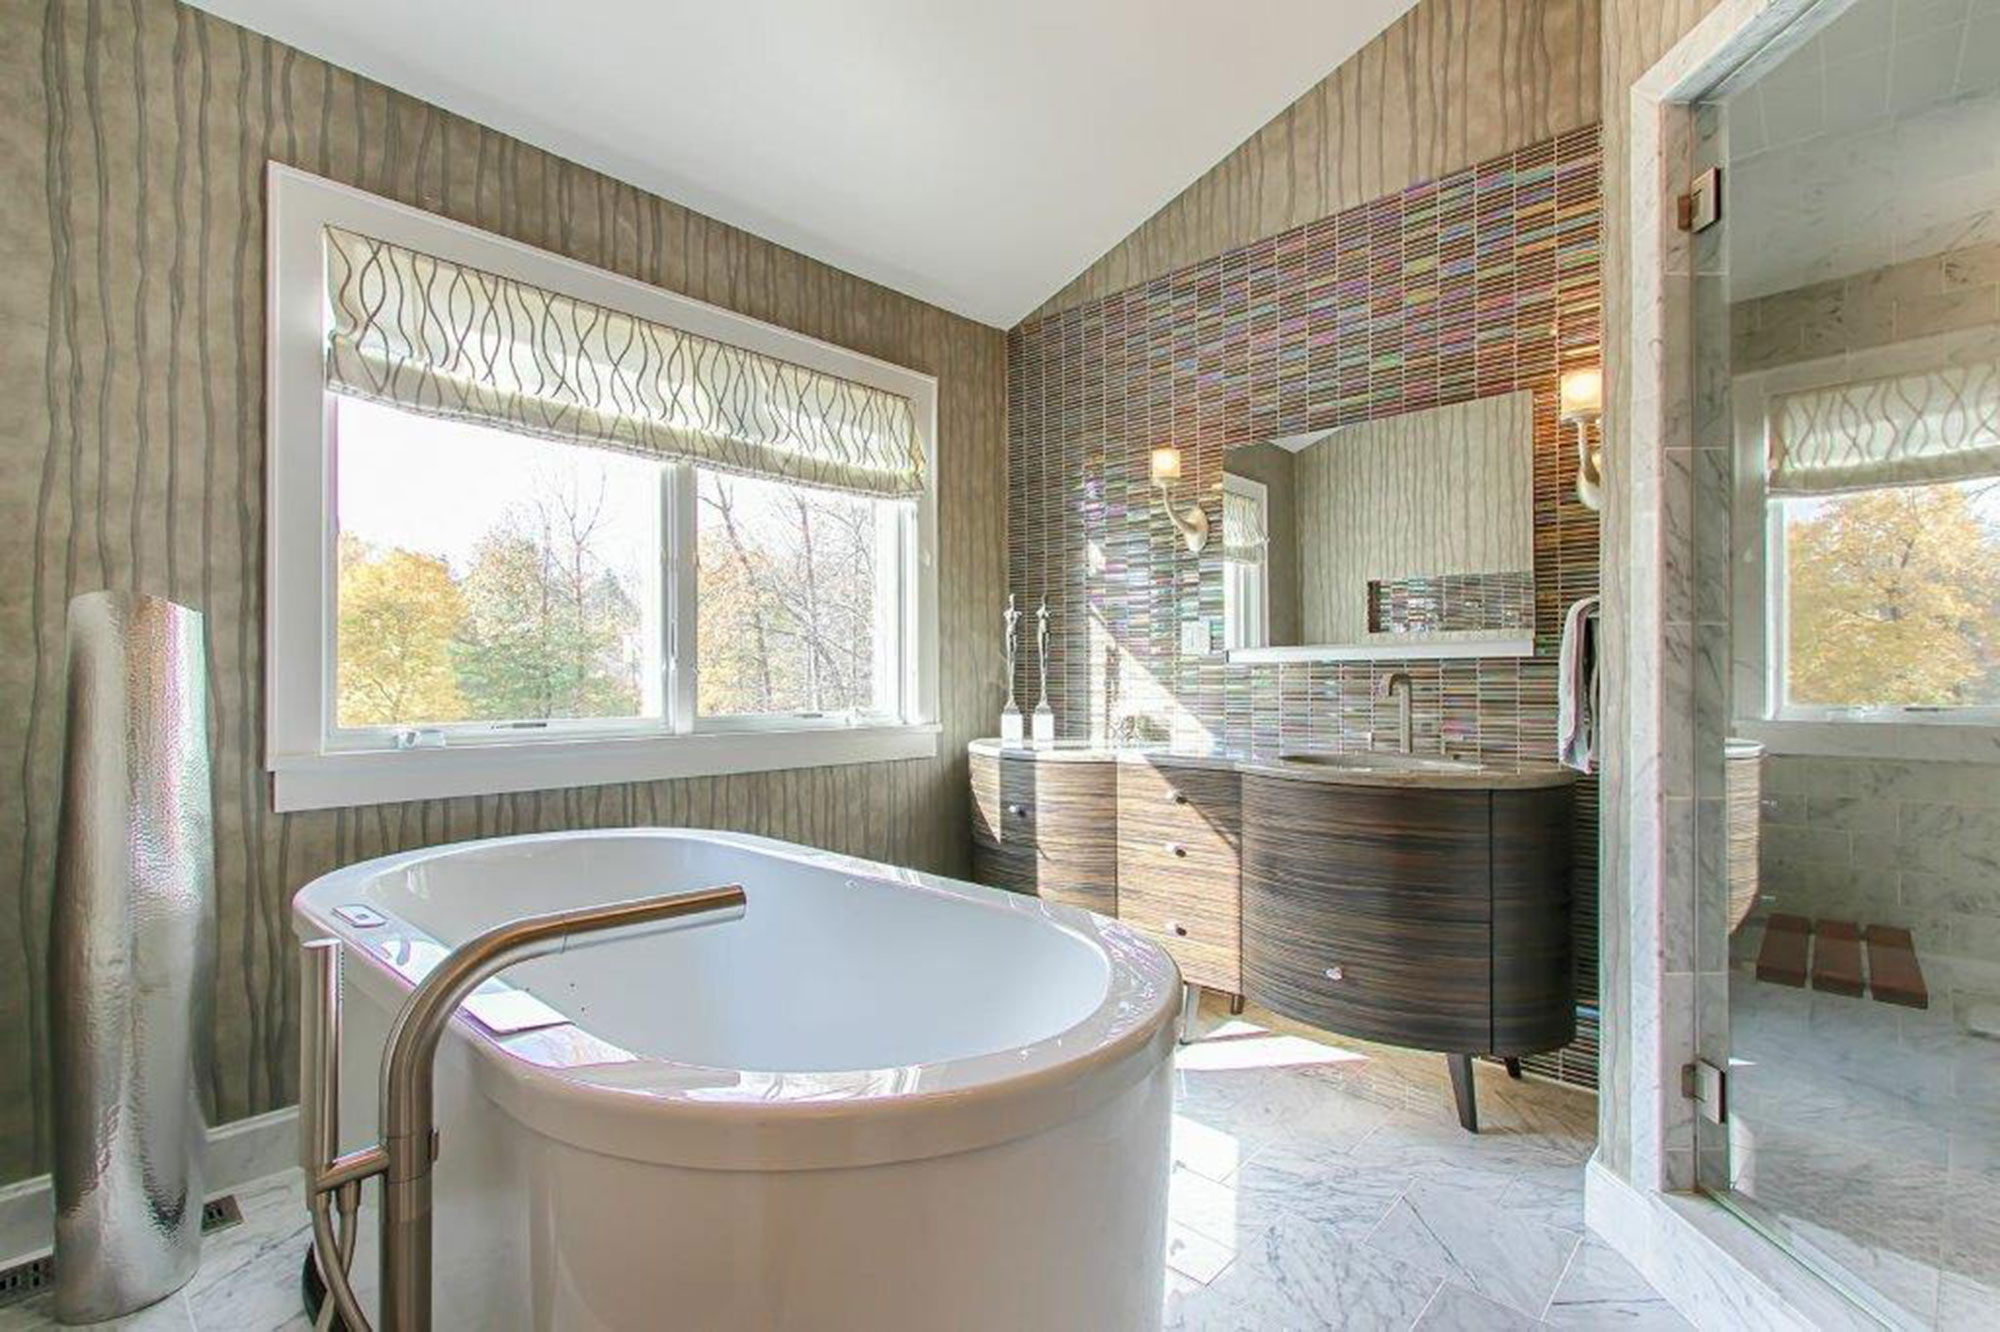 homes for sale in Morriston, NJ